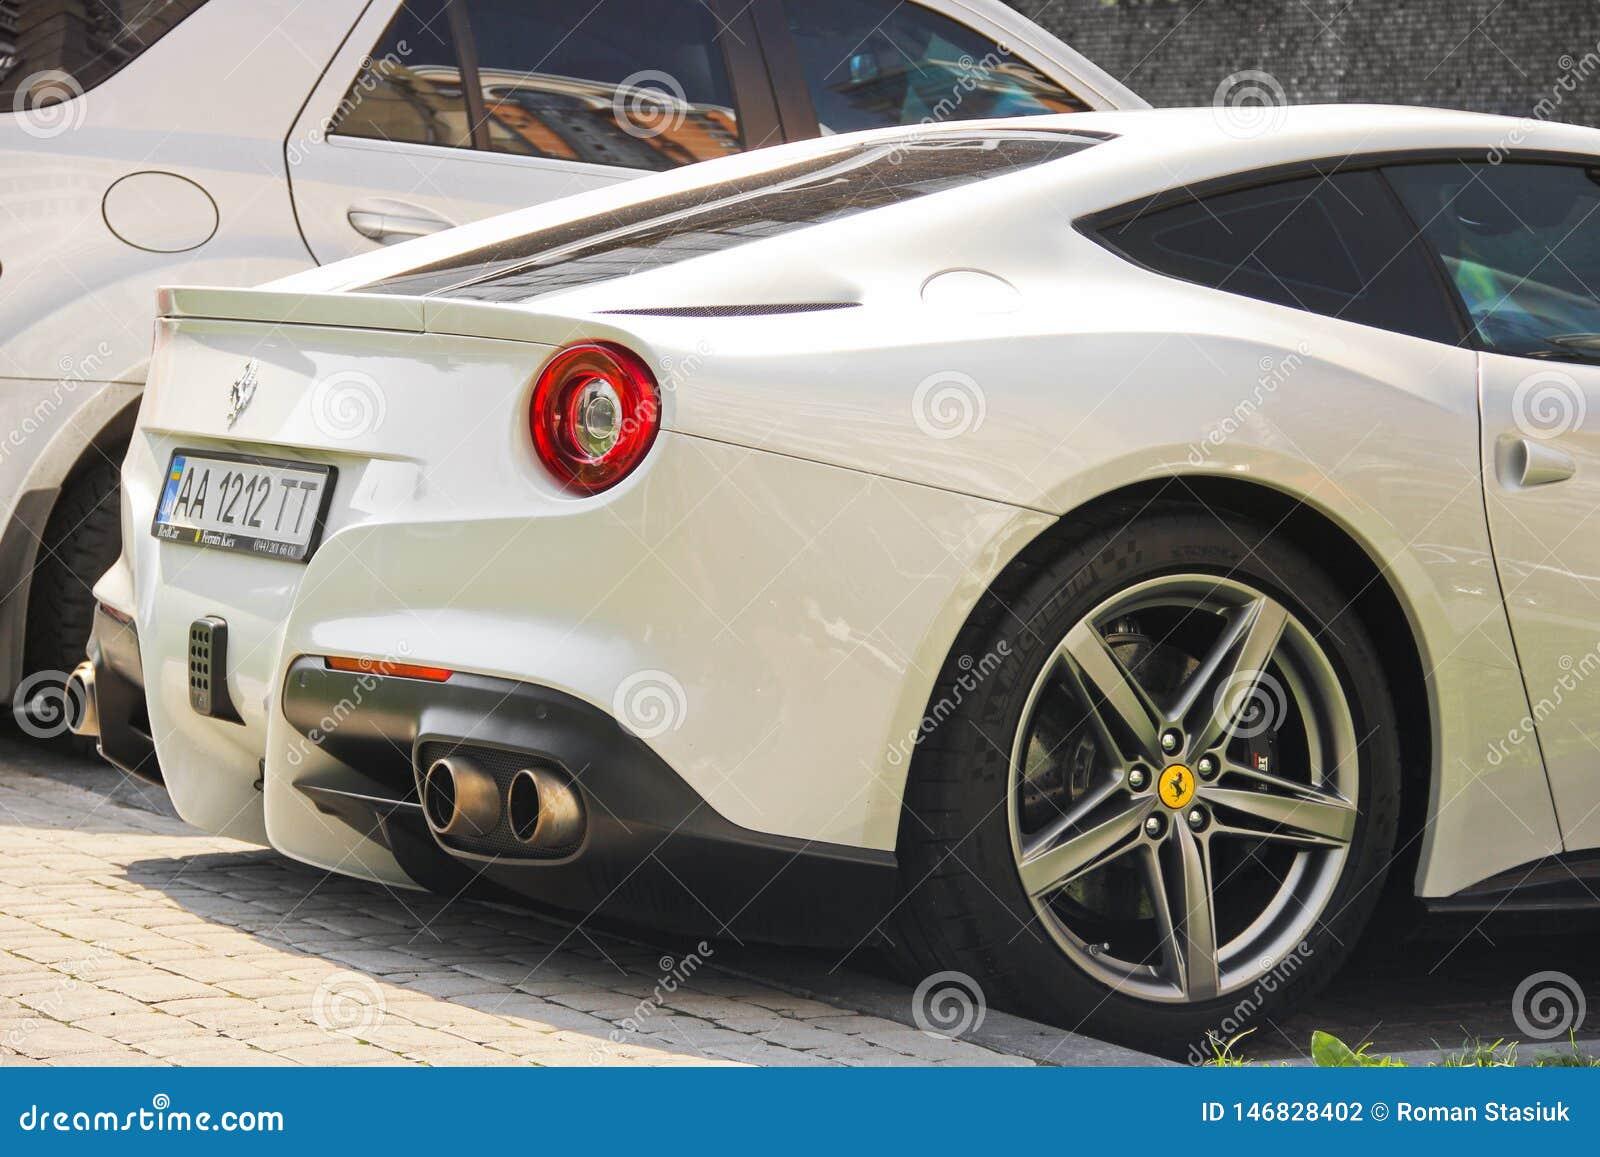 Kiev Ukraine May 3 2019 White Ferrari F12 Berlinetta In The